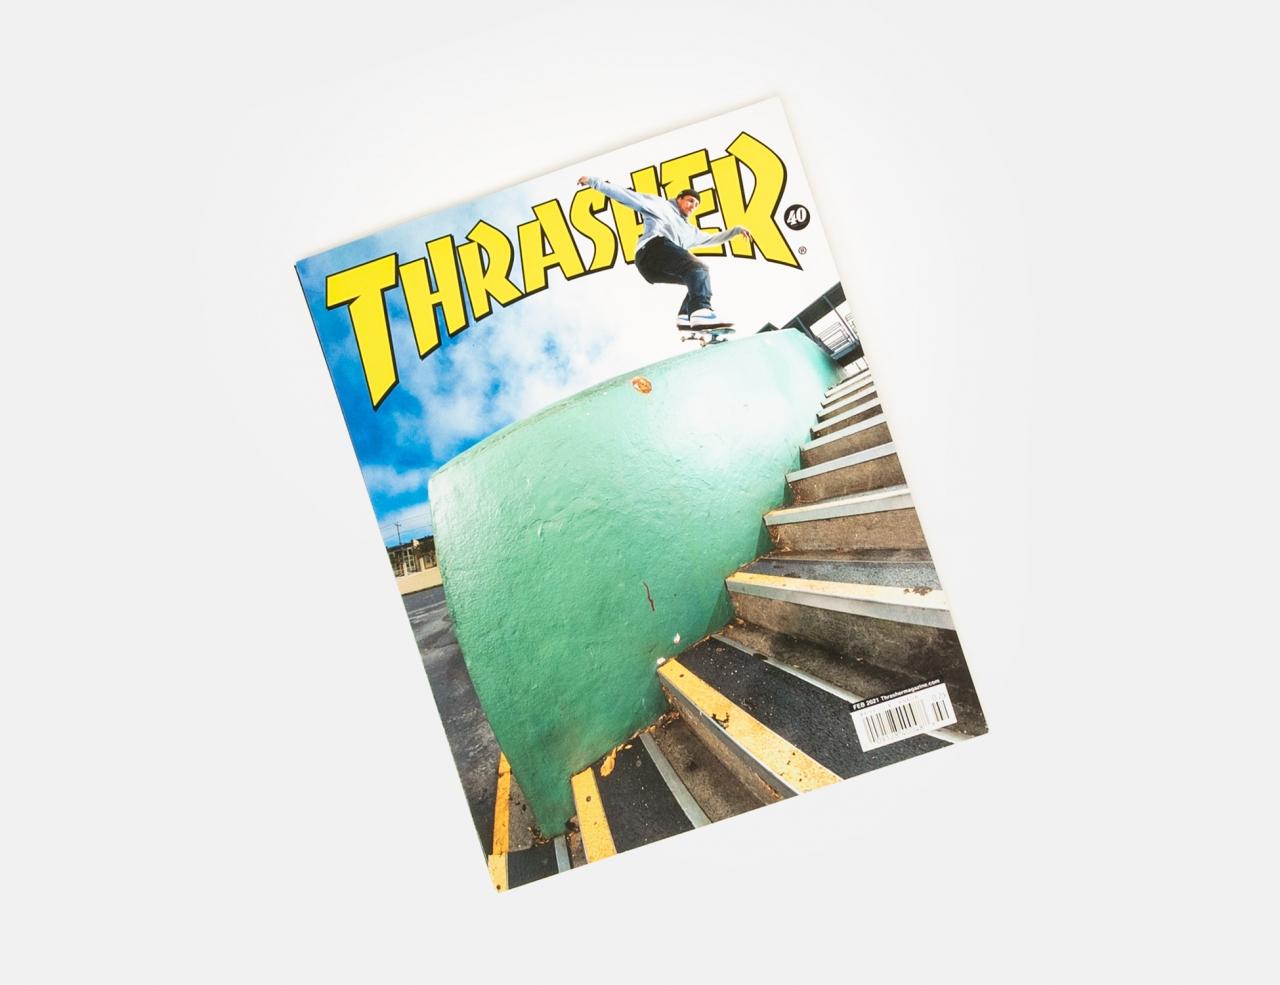 Thrasher Magazine Issues 2021 - February